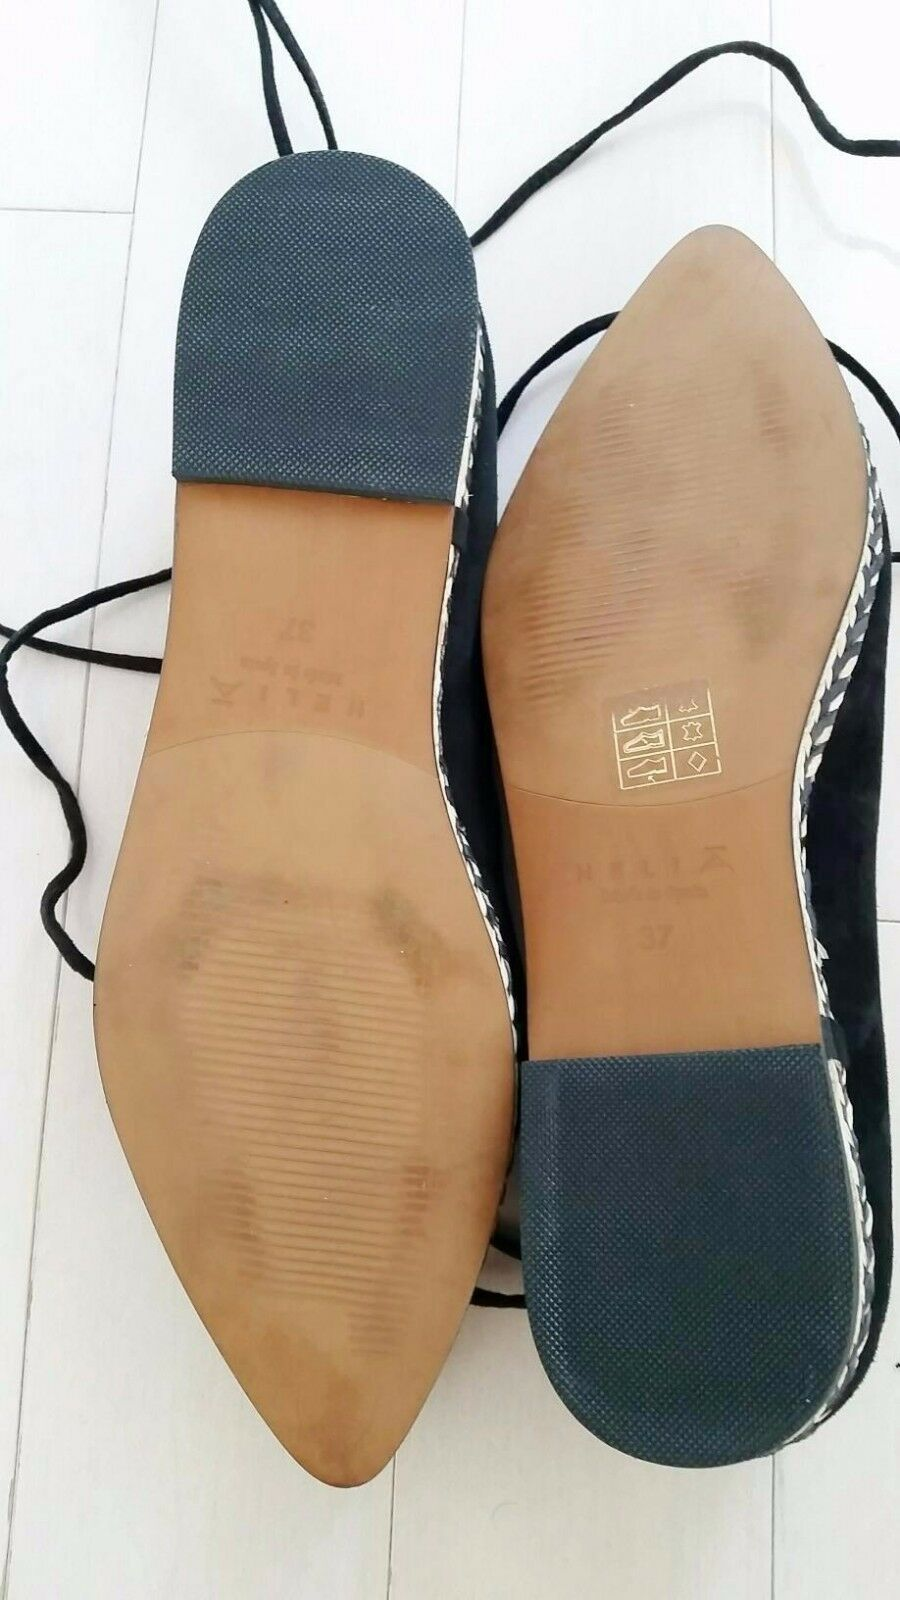 HELIA Made in Spain Pointy BLACK SUEDE Flat ( Strap Schuhe Leder Upper ( Flat 37 ) fdf552